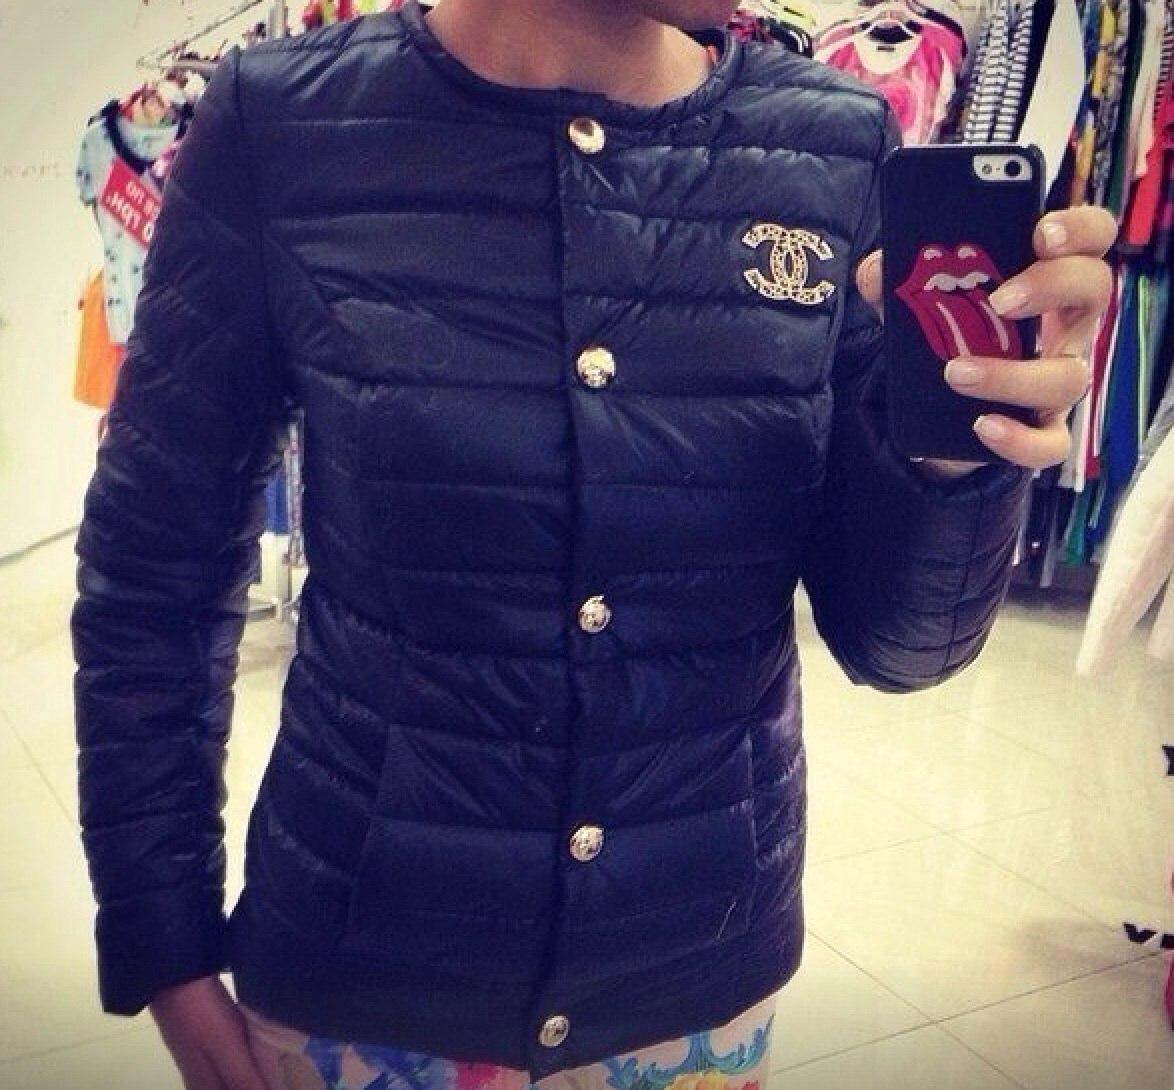 Женская осенняя куртка спорт фото цена 6